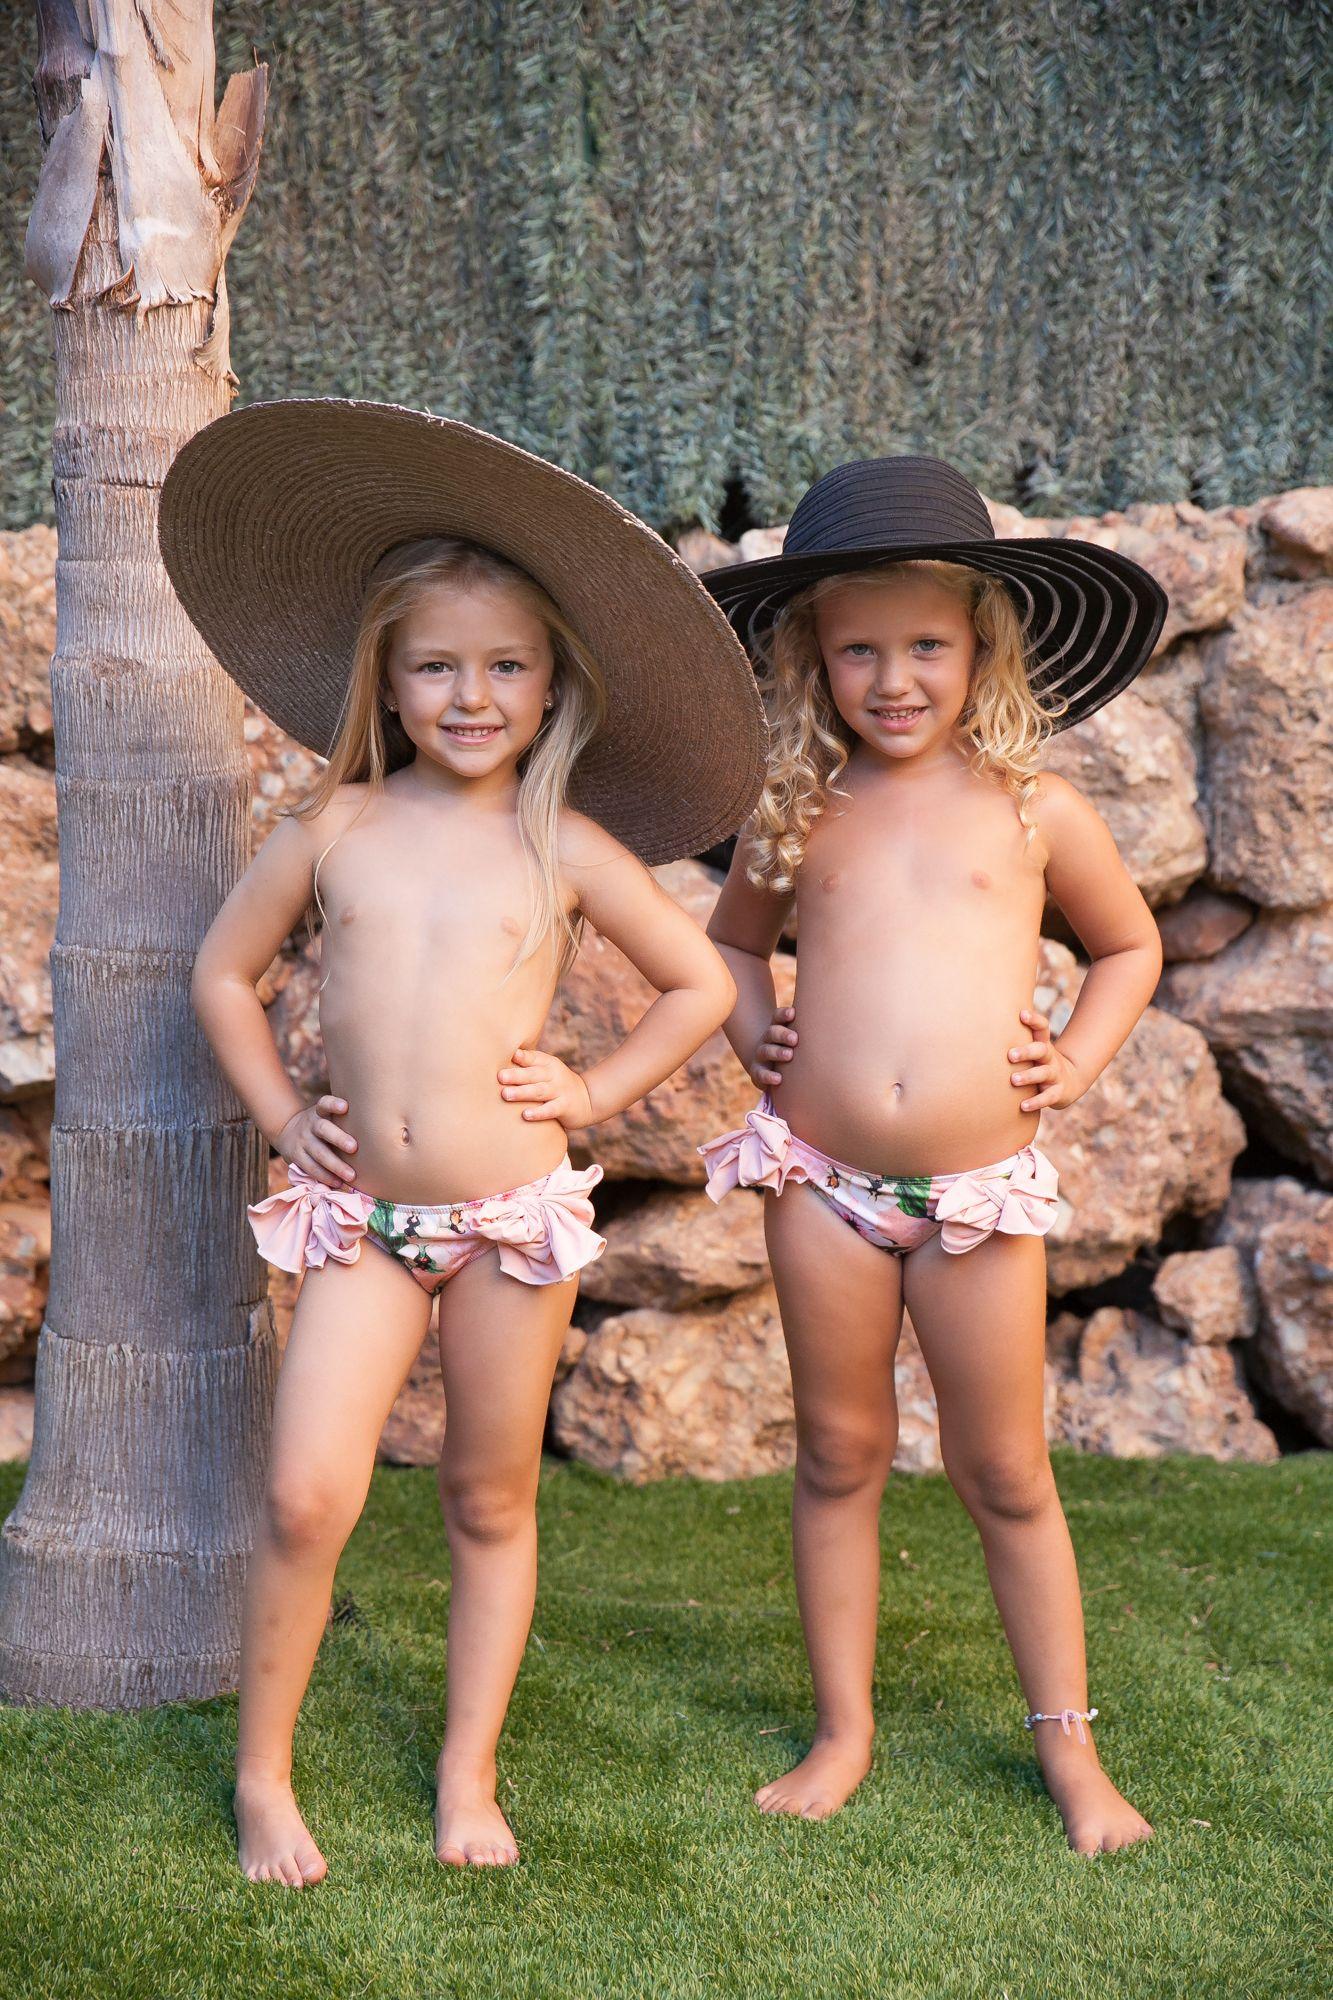 culetin bikini Culetin, bikini y trikini de niña de la... - Belen Zotano ...